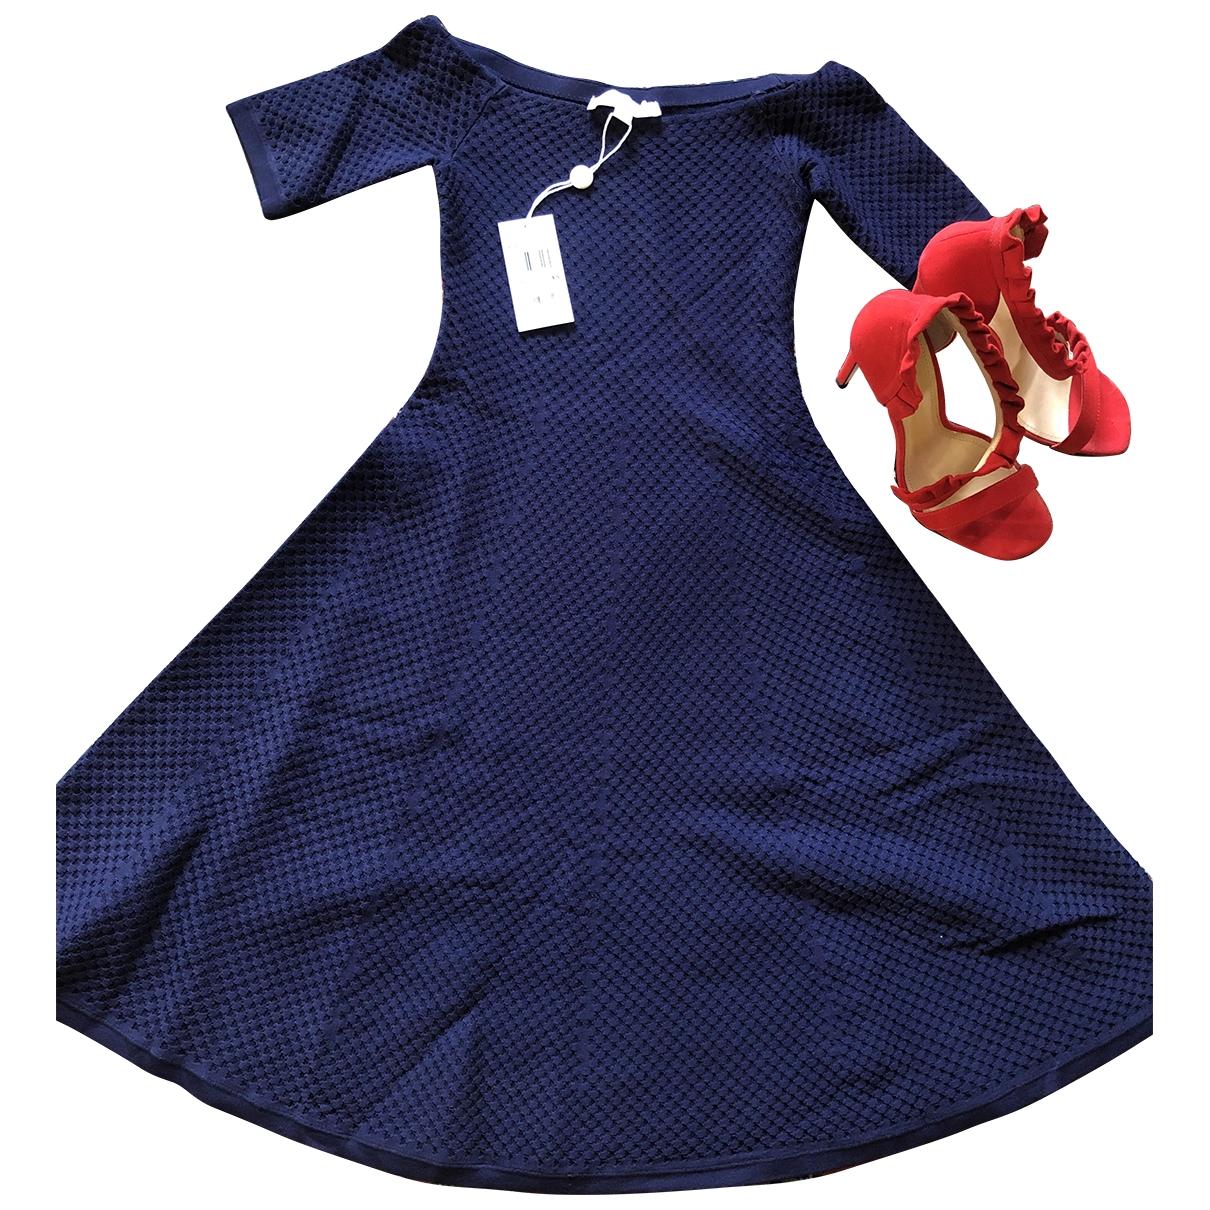 Michael Kors \N Blue dress for Women XS International